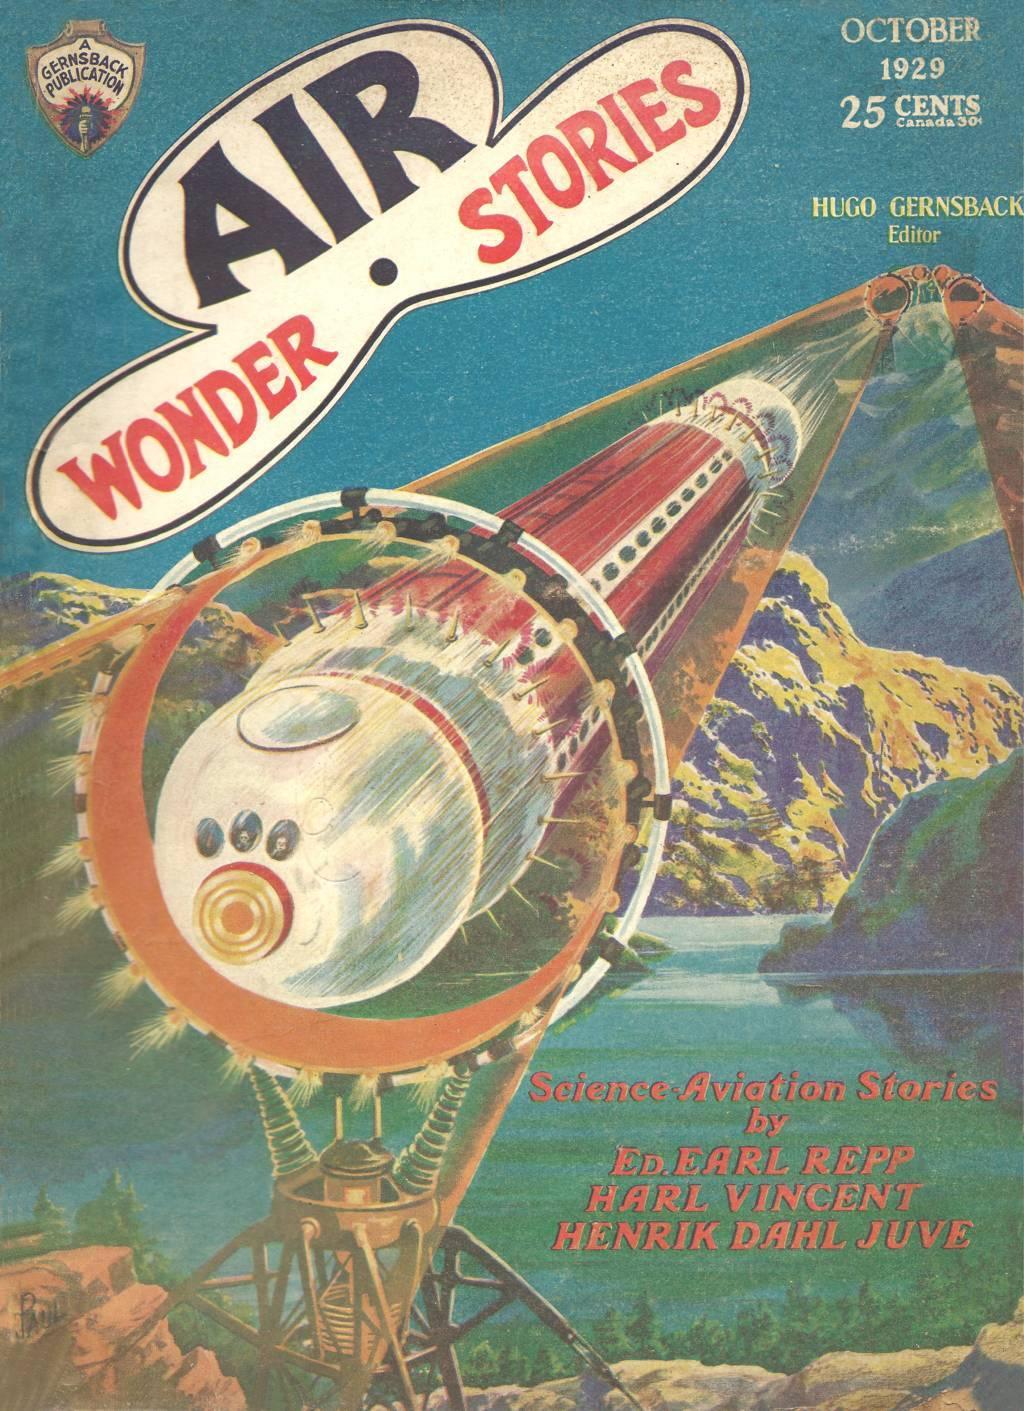 Comic Book Cover For Air Wonder Stories 04 - The Sky Maniac - Henrik Dahl Juve